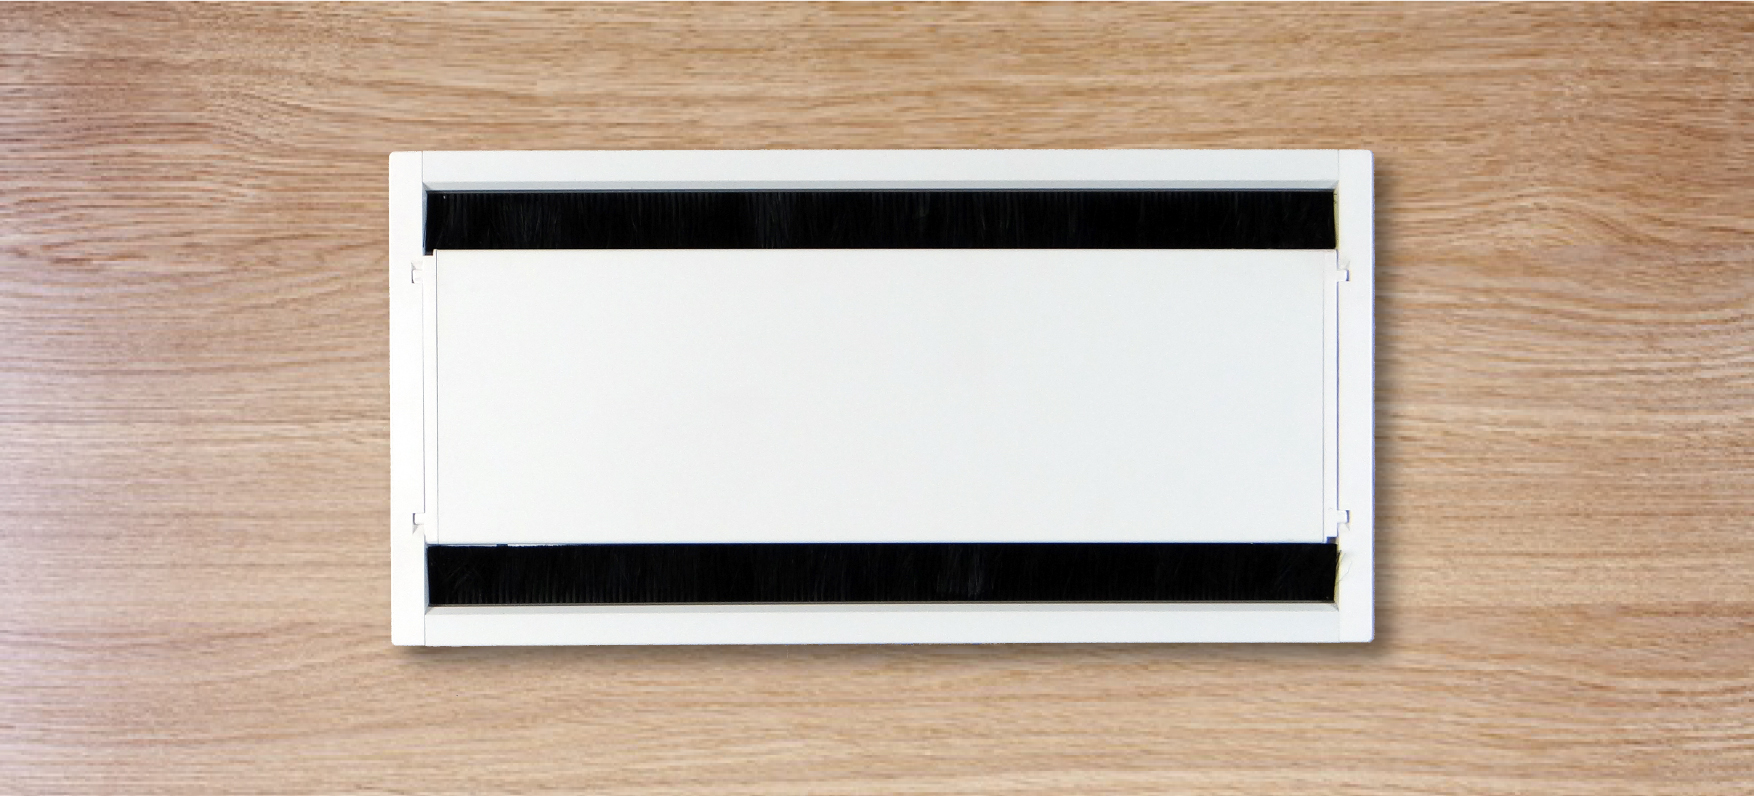 CONFERENCE MID DOUBLE WHITE 5x 220 + 4xLAN + 1x HDMI + 1 USB3 + 1VGA